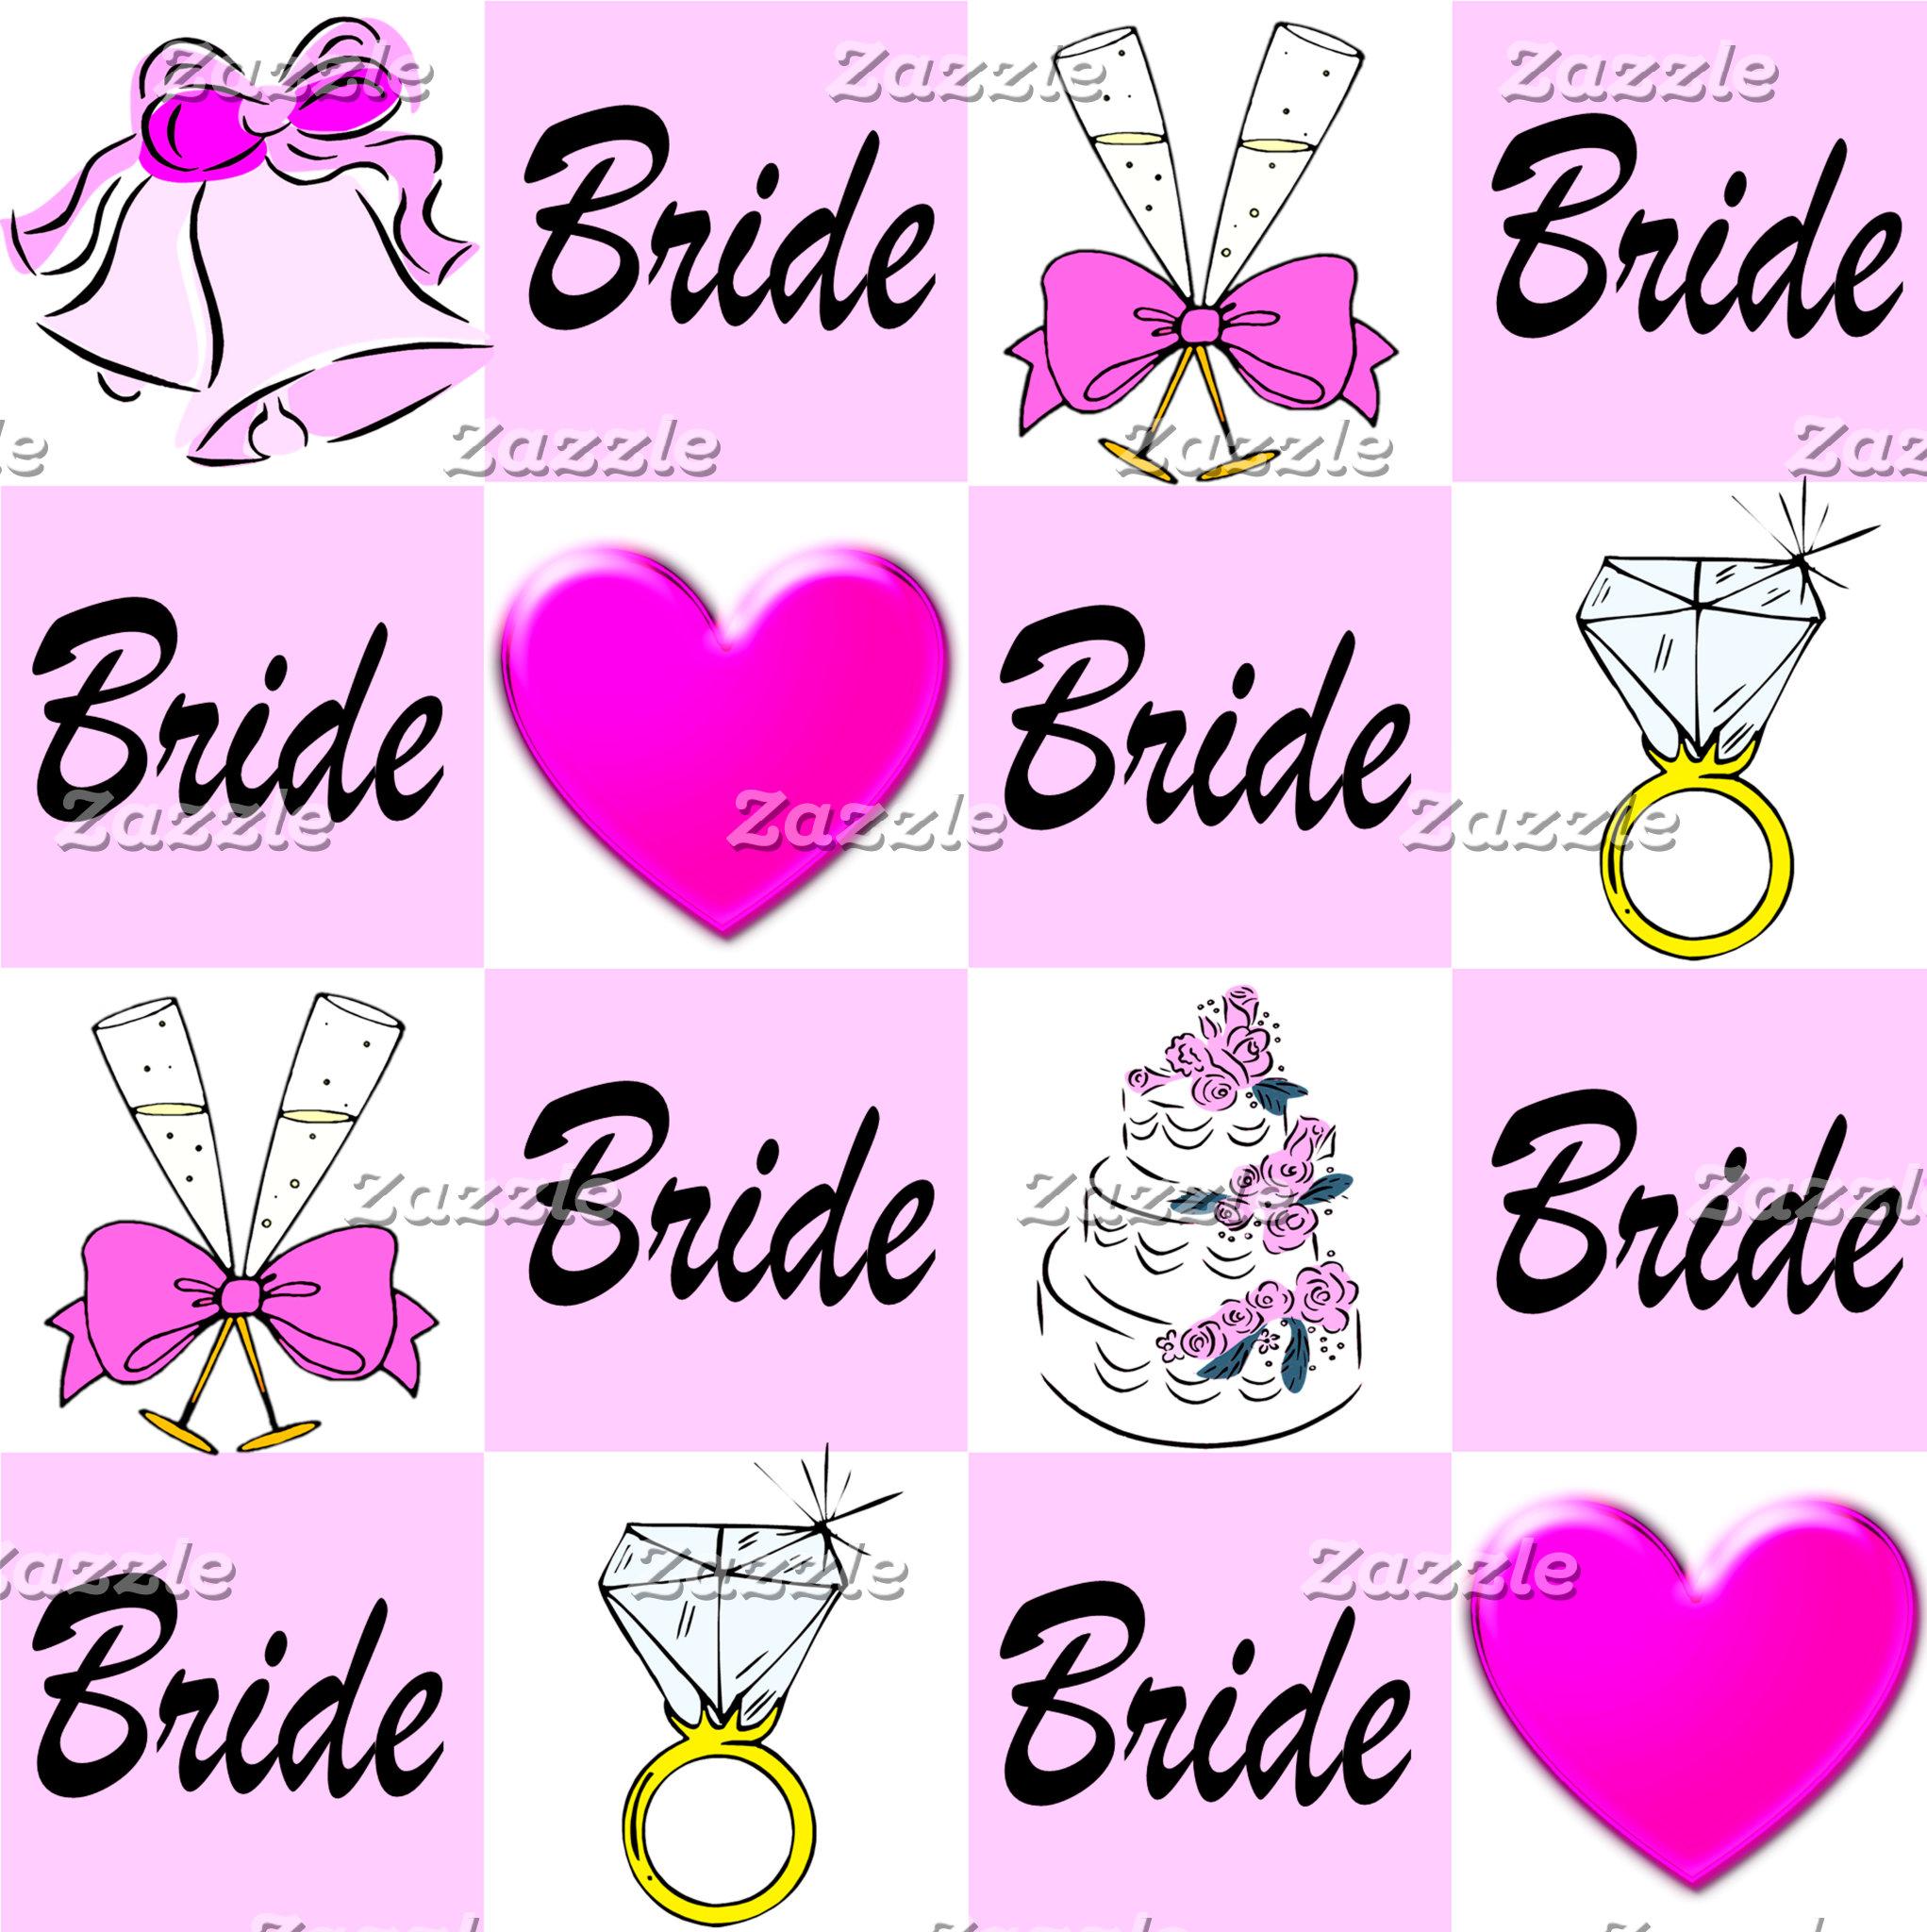 BRIDAL AND WEDDING